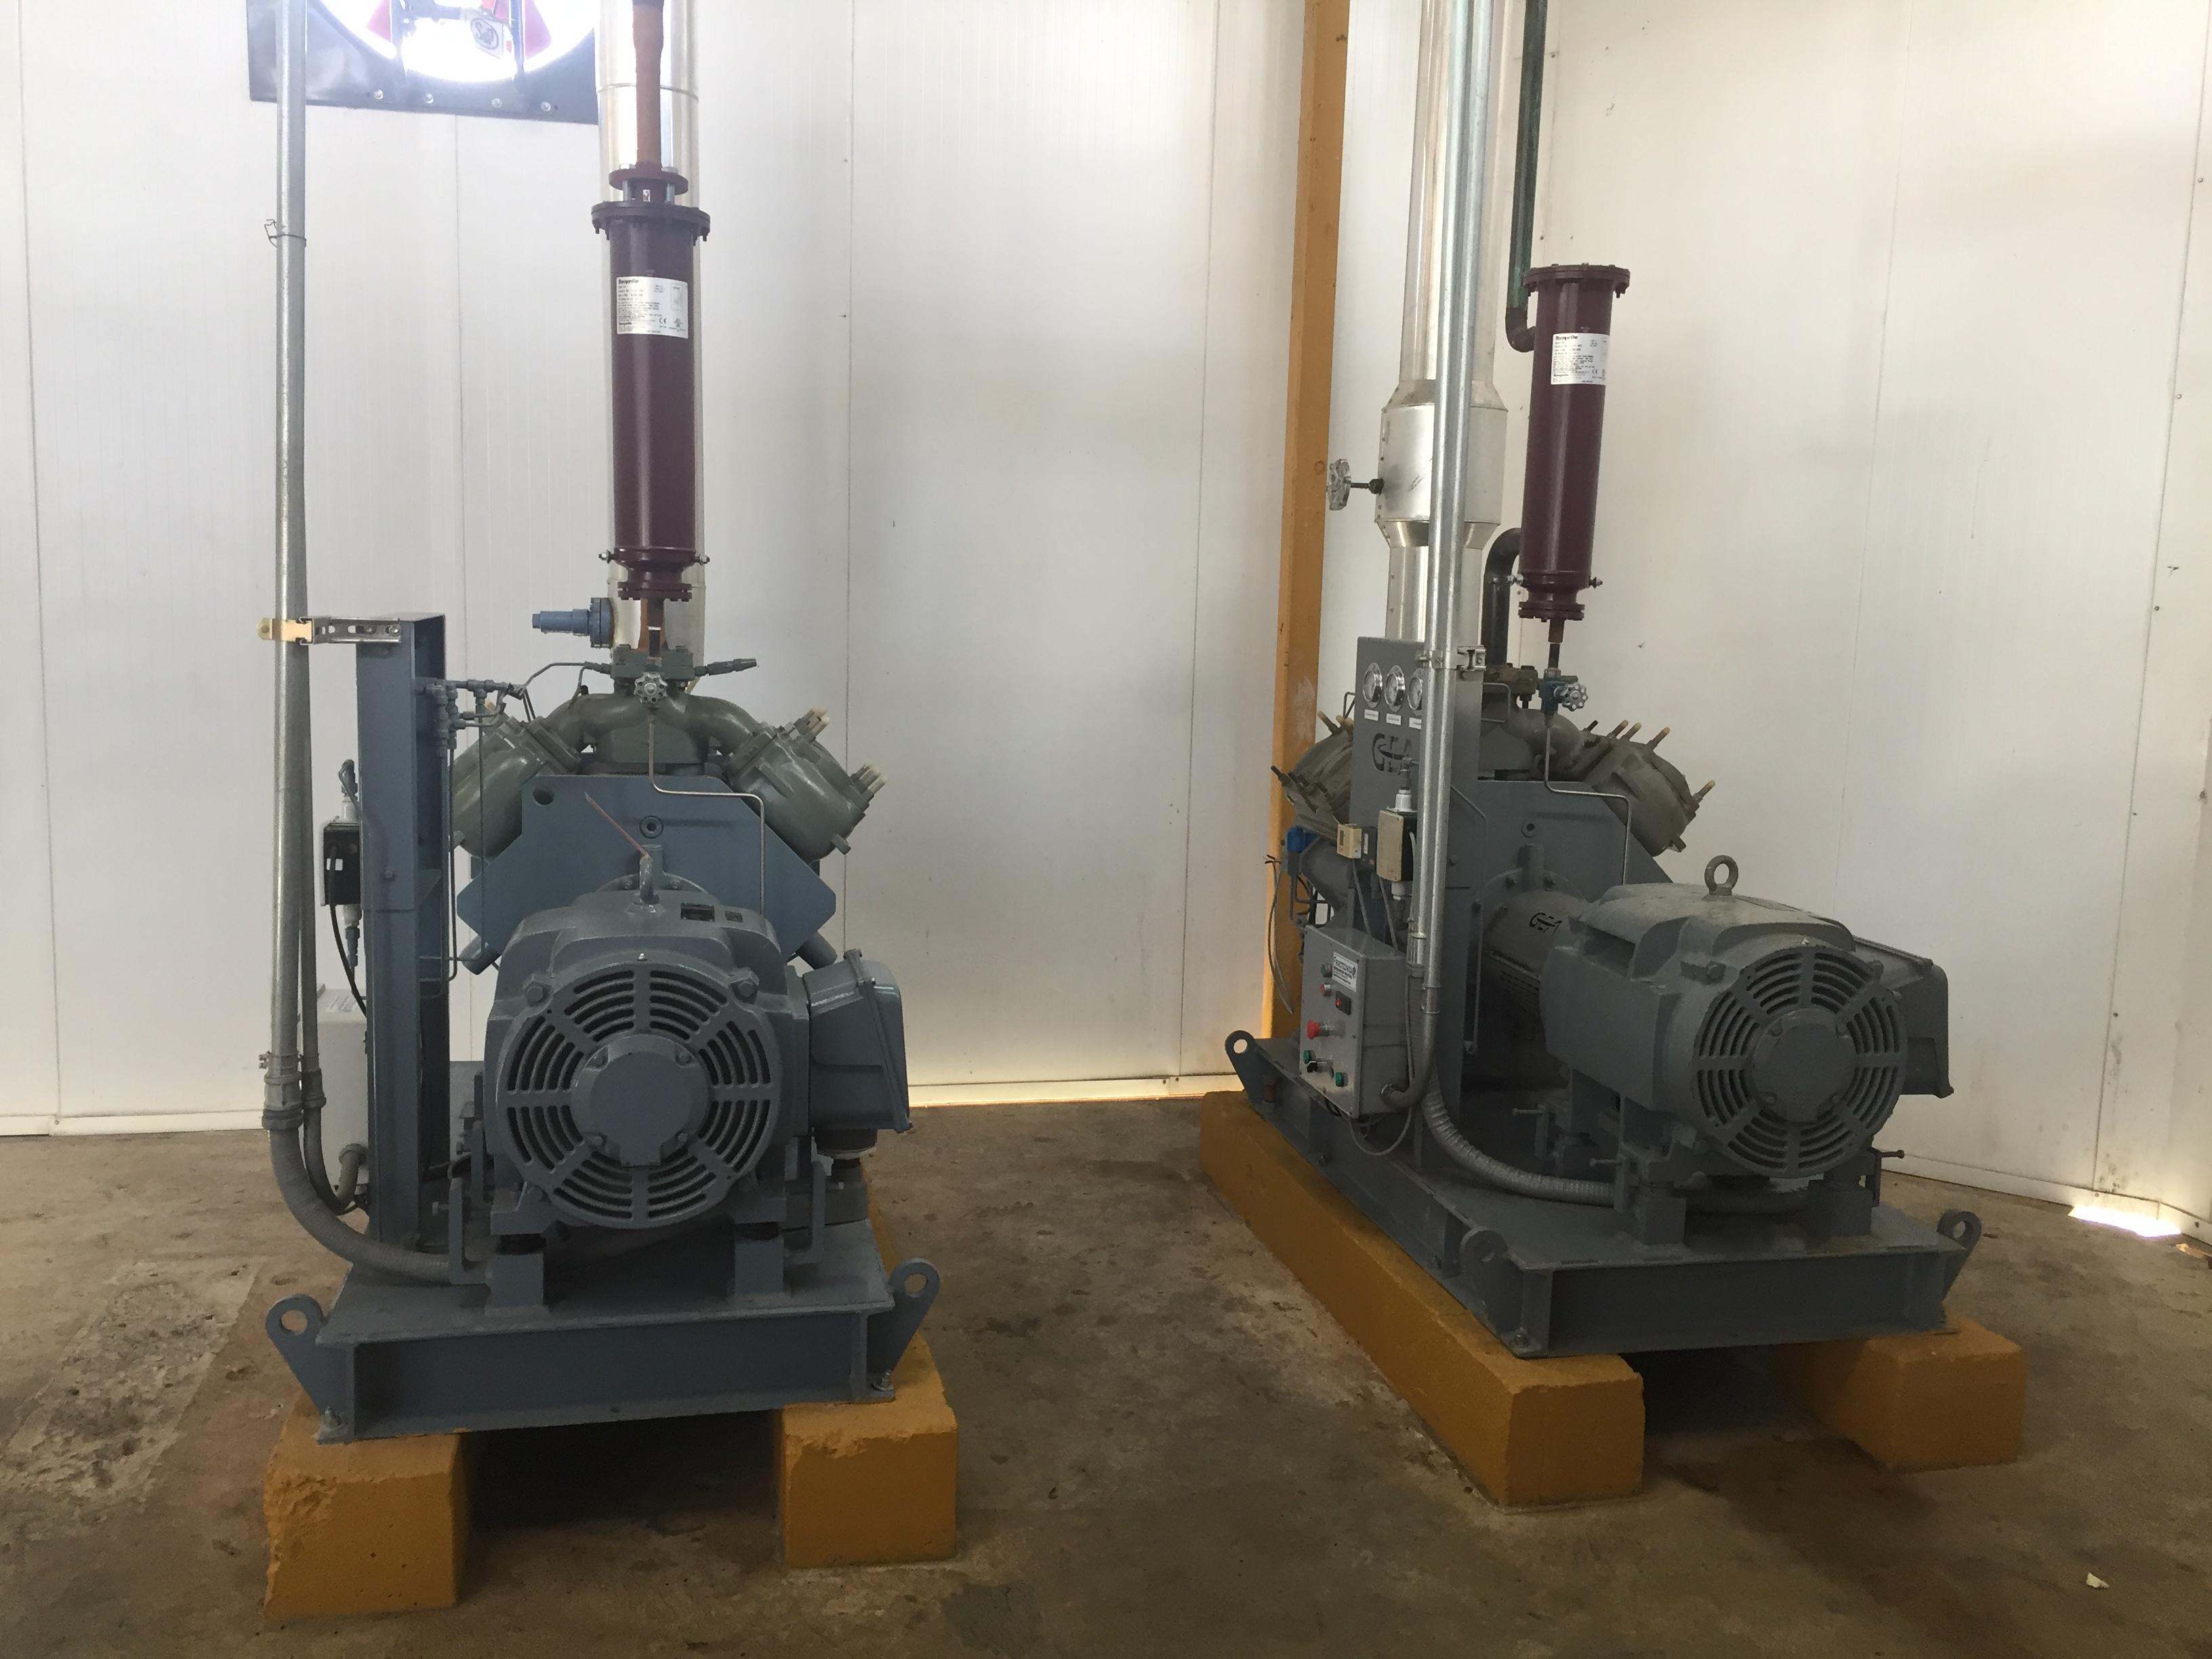 Gea compressor. Refrigeration equipment for poultry